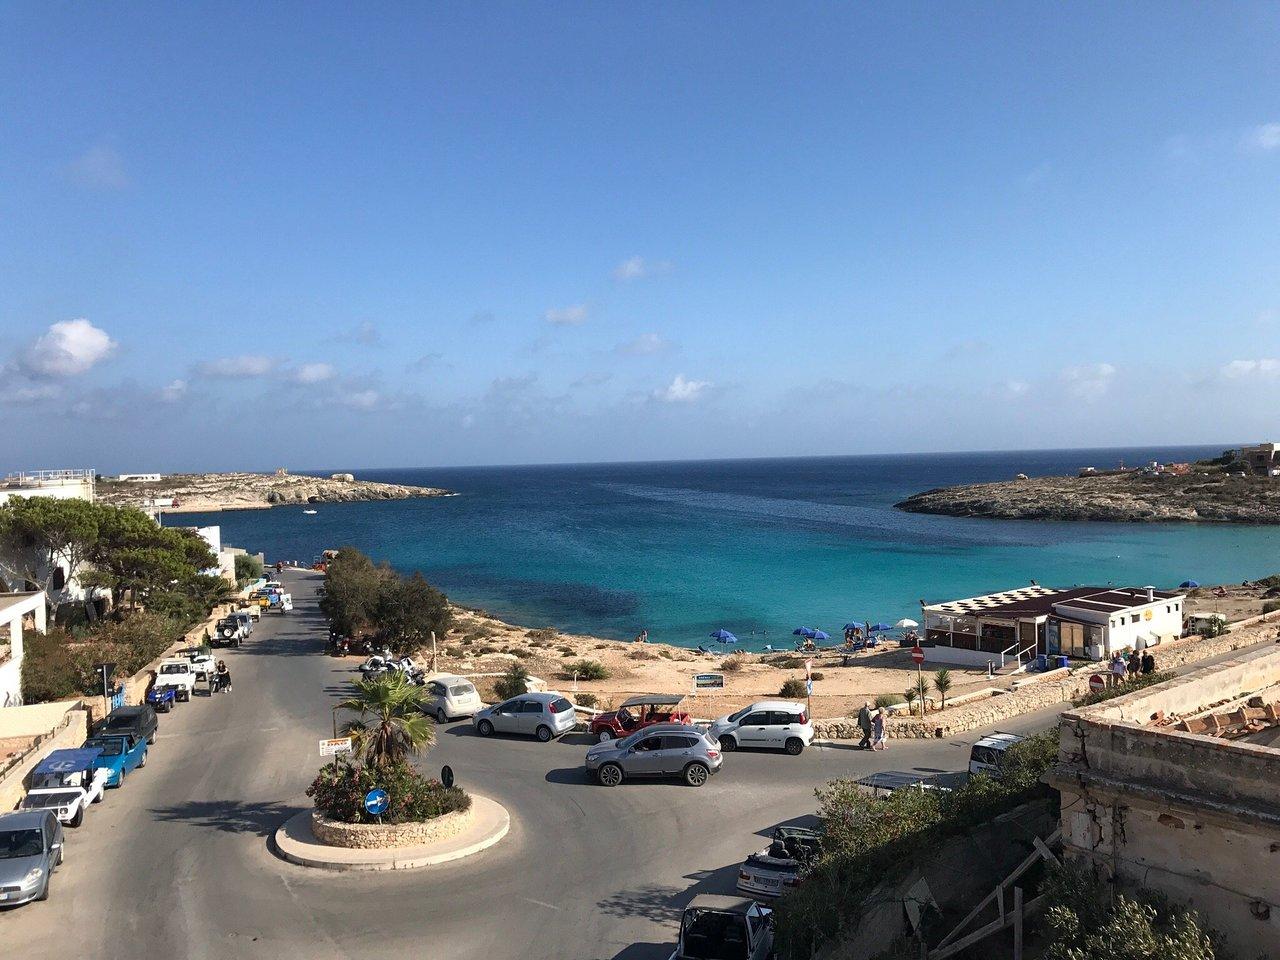 Lampedusa: I migliori pacchetti vacanze - TripAdvisor